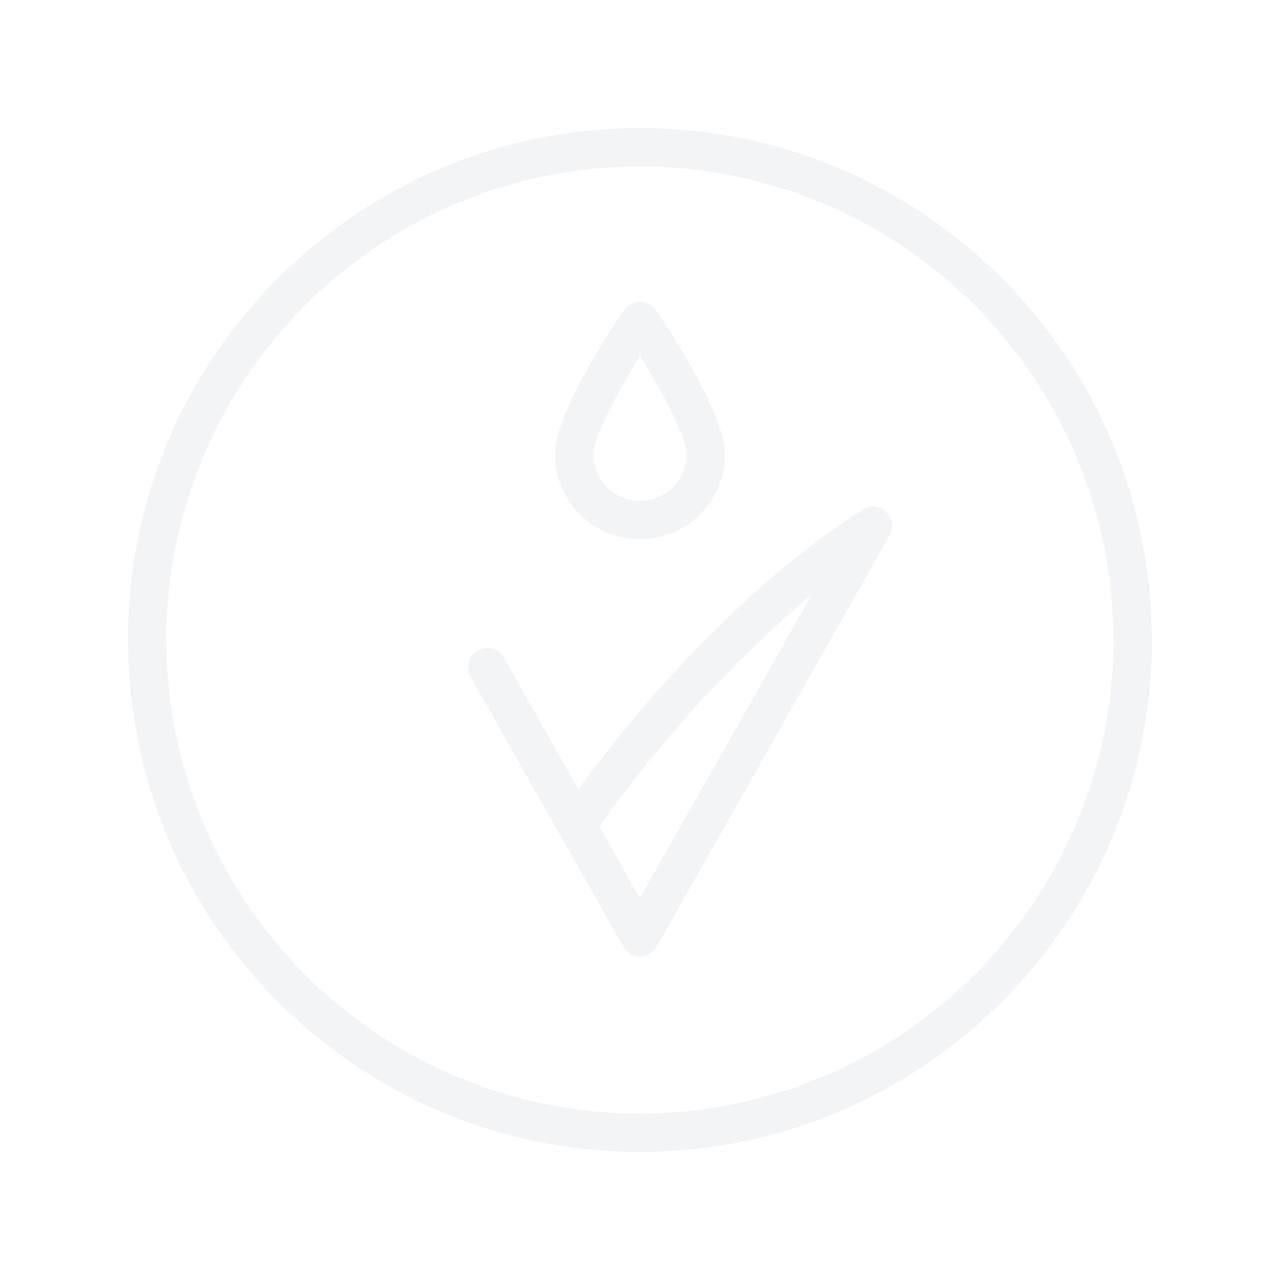 WELLA PROFESSIONALS Sp Liquid Hair 100ml